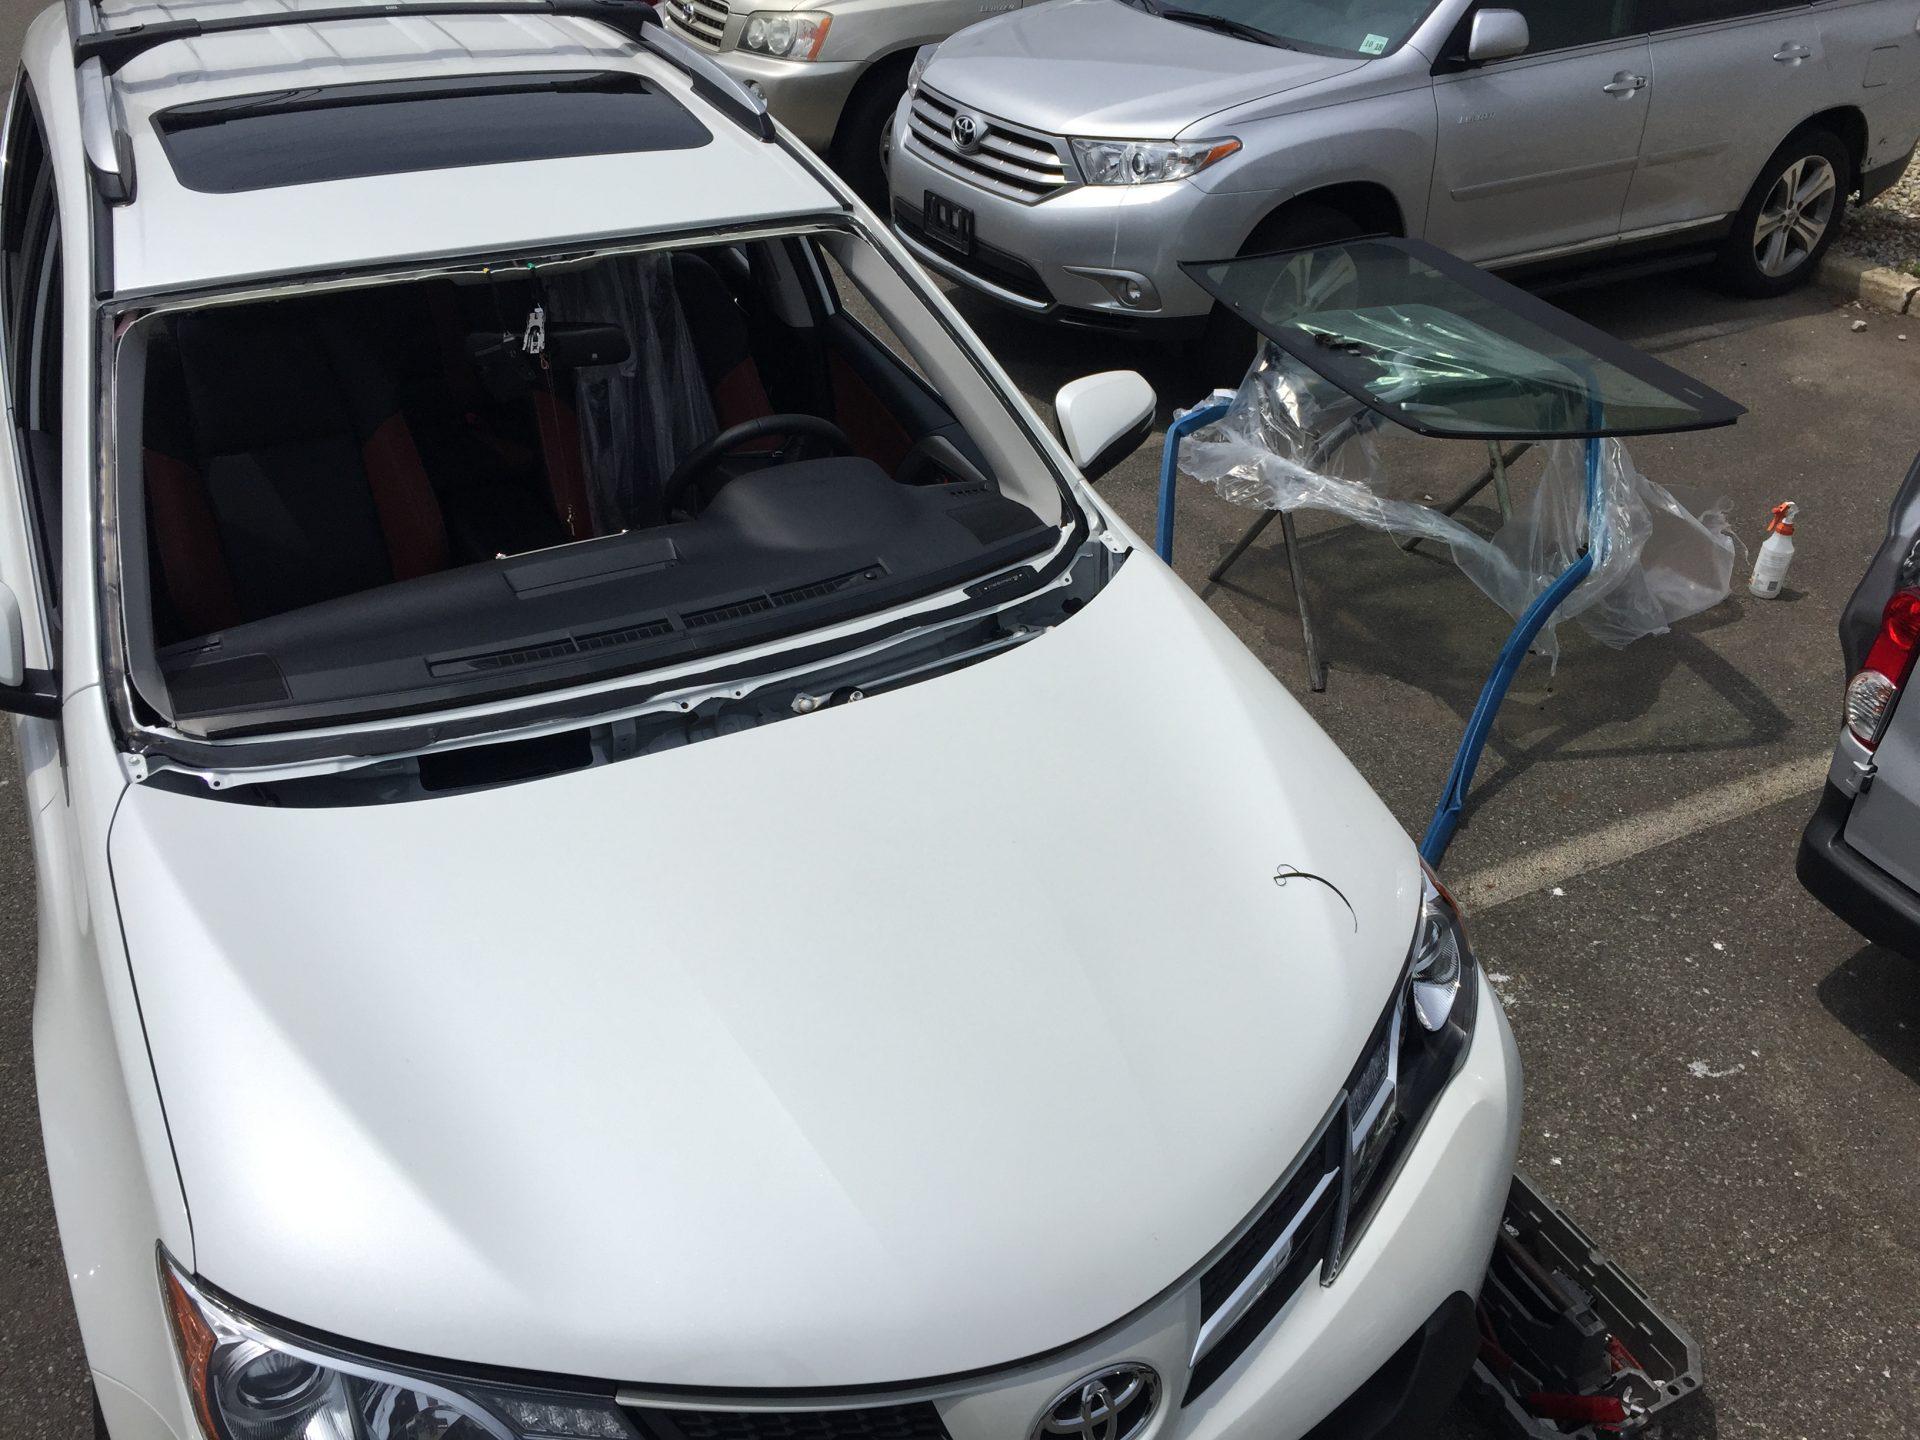 2018 Toyota Rav4 Windshield Replacement NJ Platinum Auto Glass NJ @732-993-6844@platinumautoglassnj